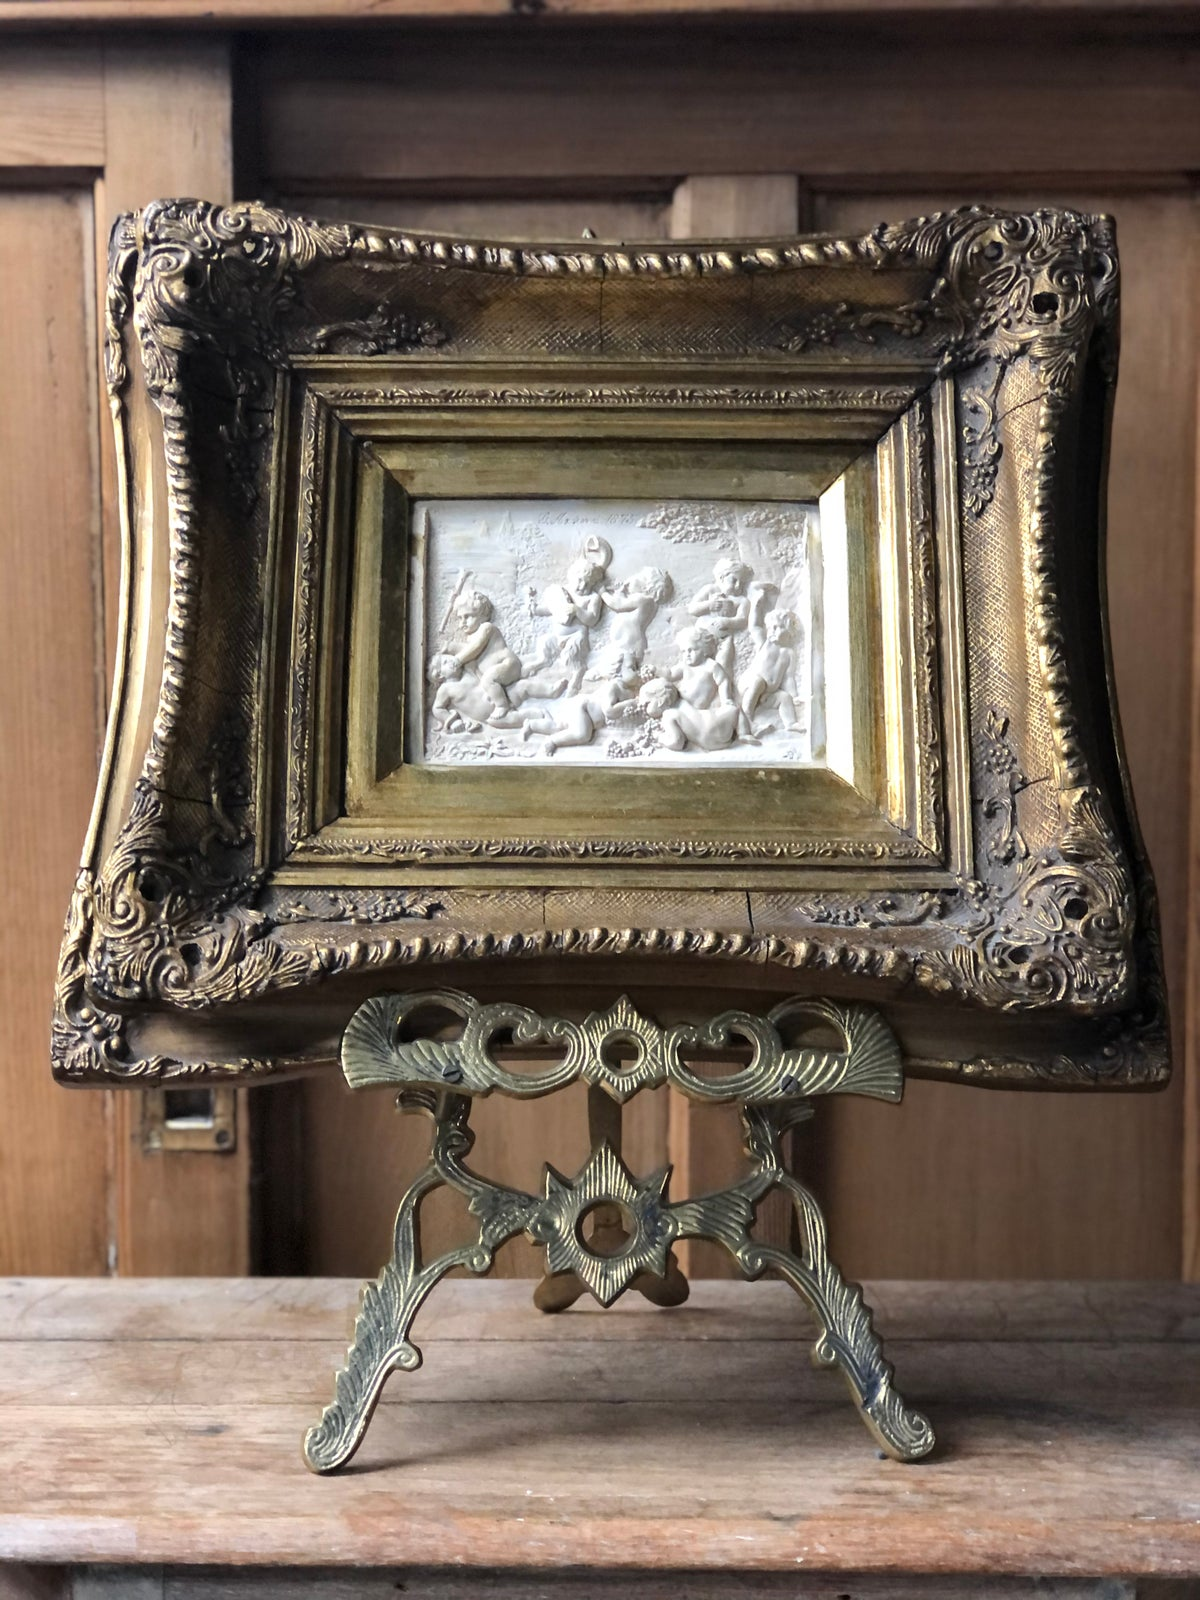 Image of Relief cherub plaque in ornate frame